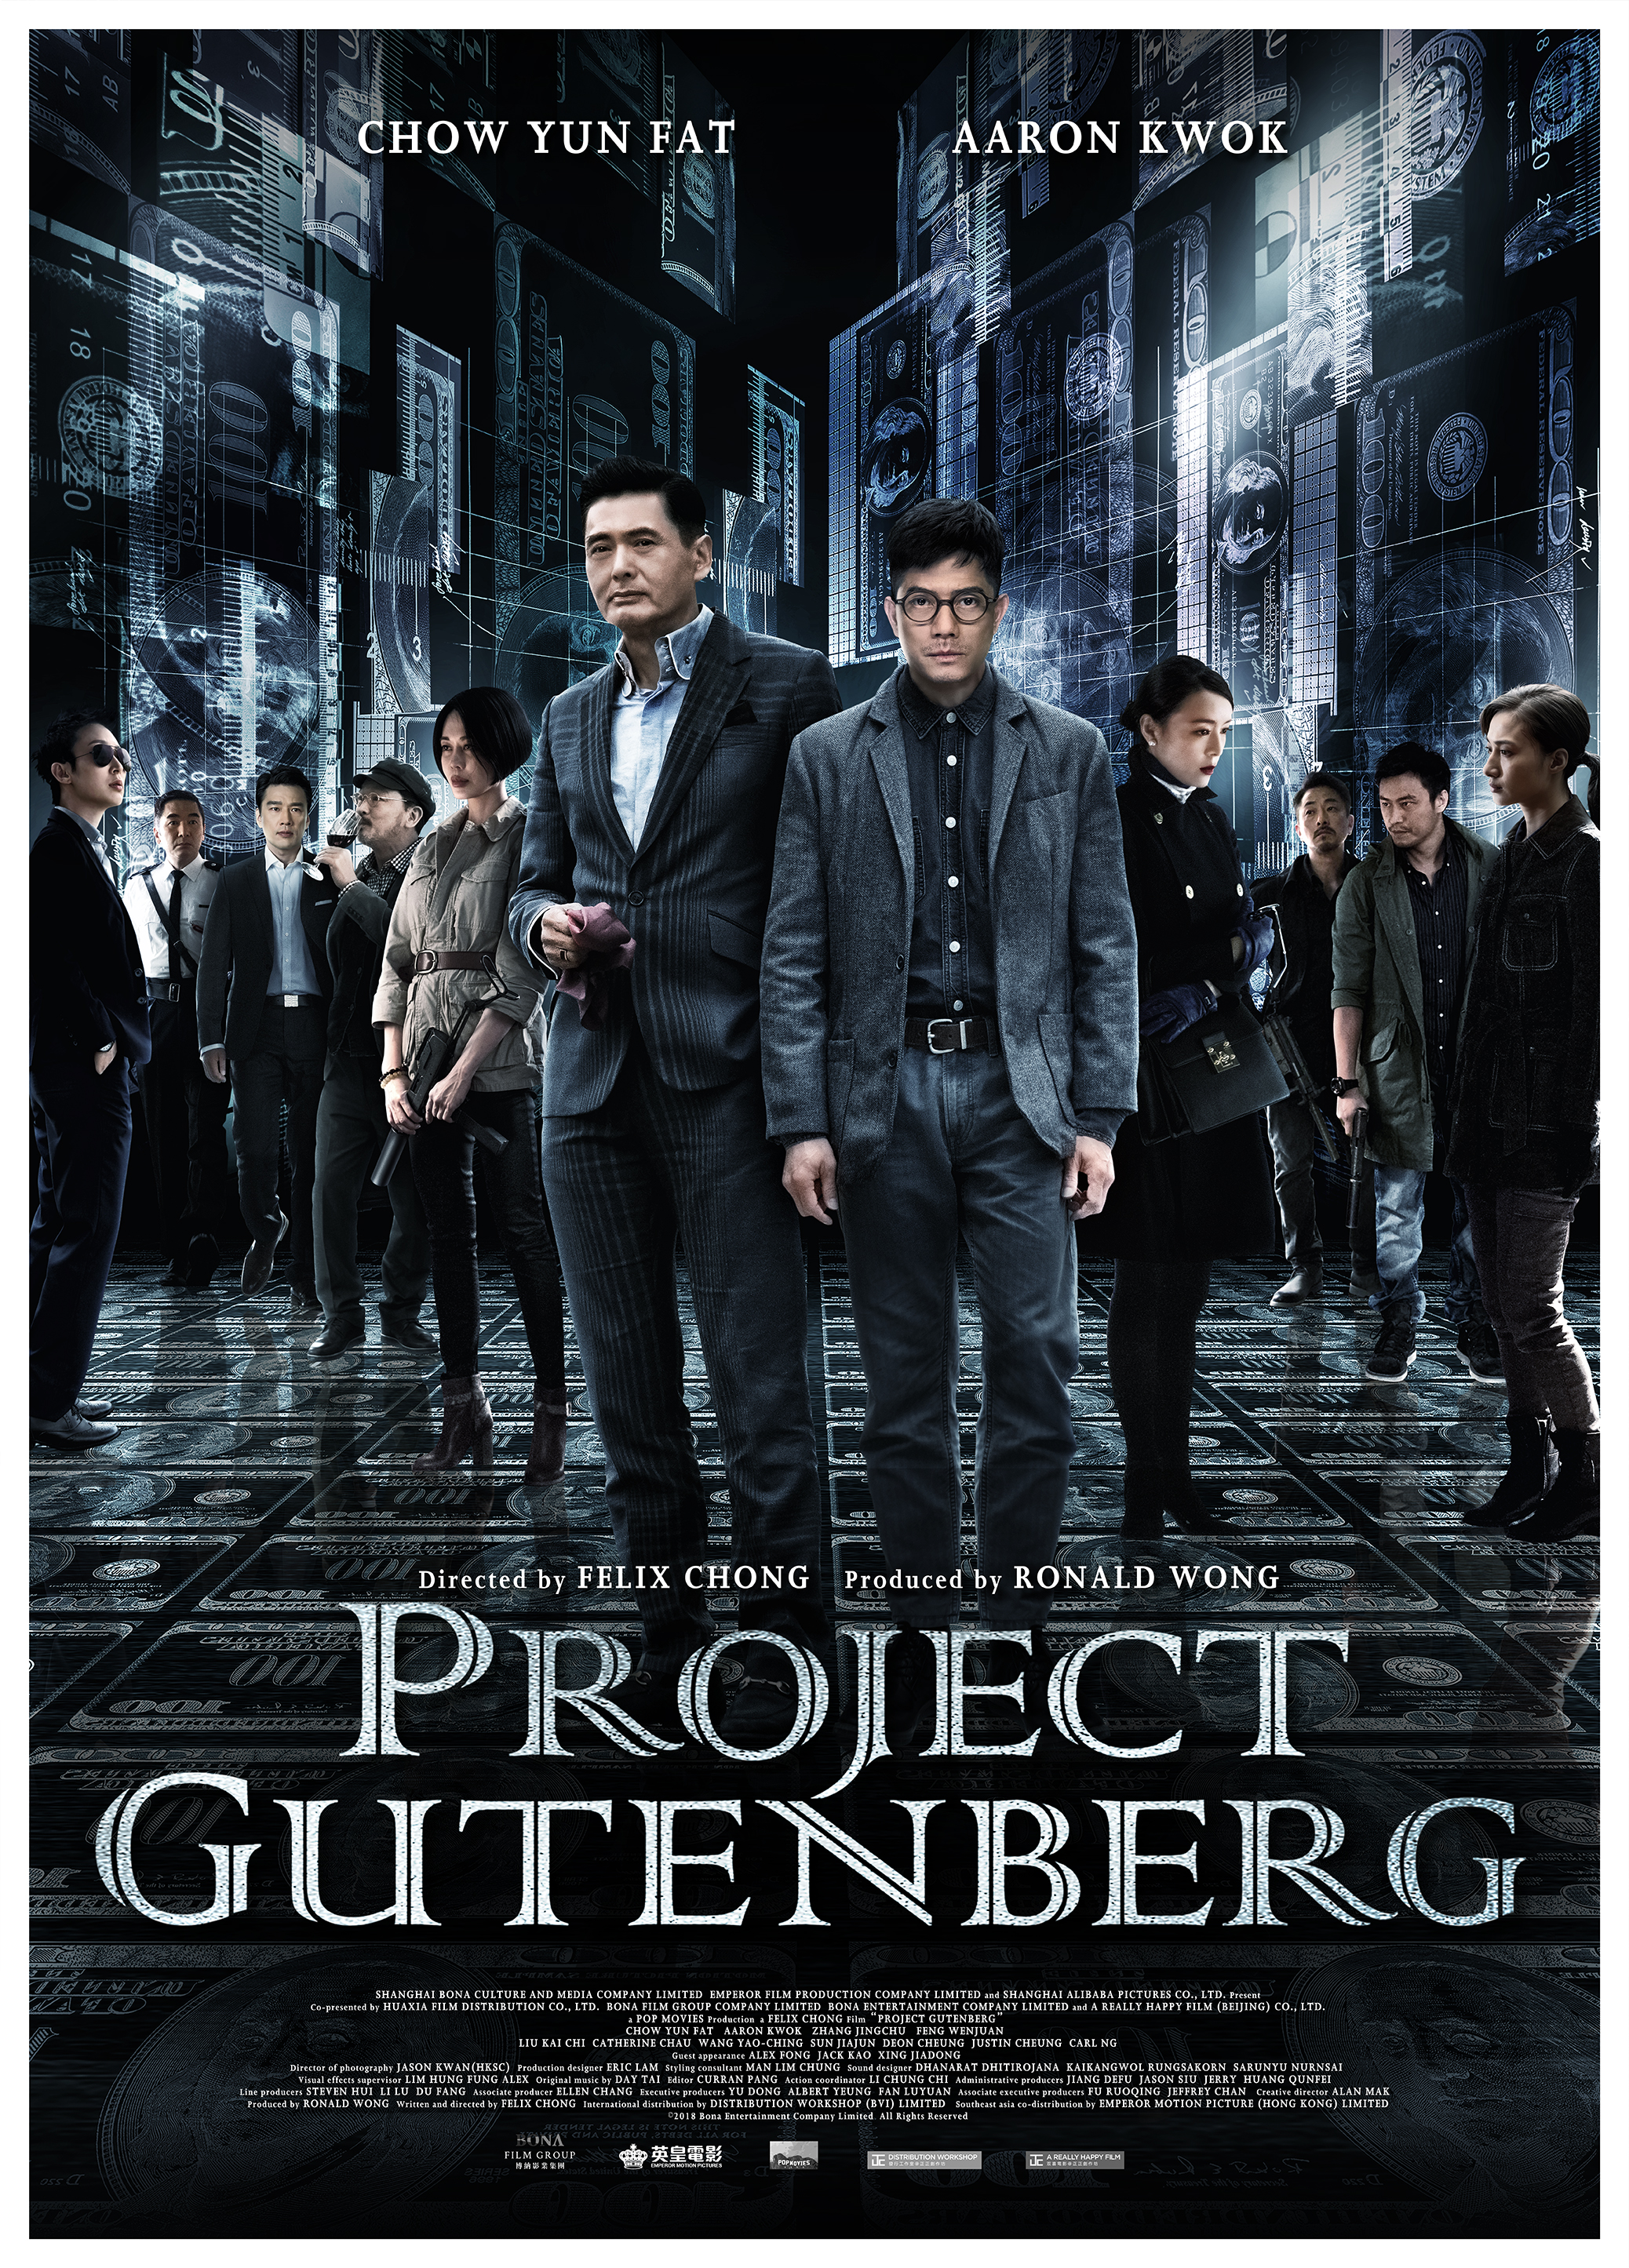 PG Group Poster Finished Artwork_English.jpg